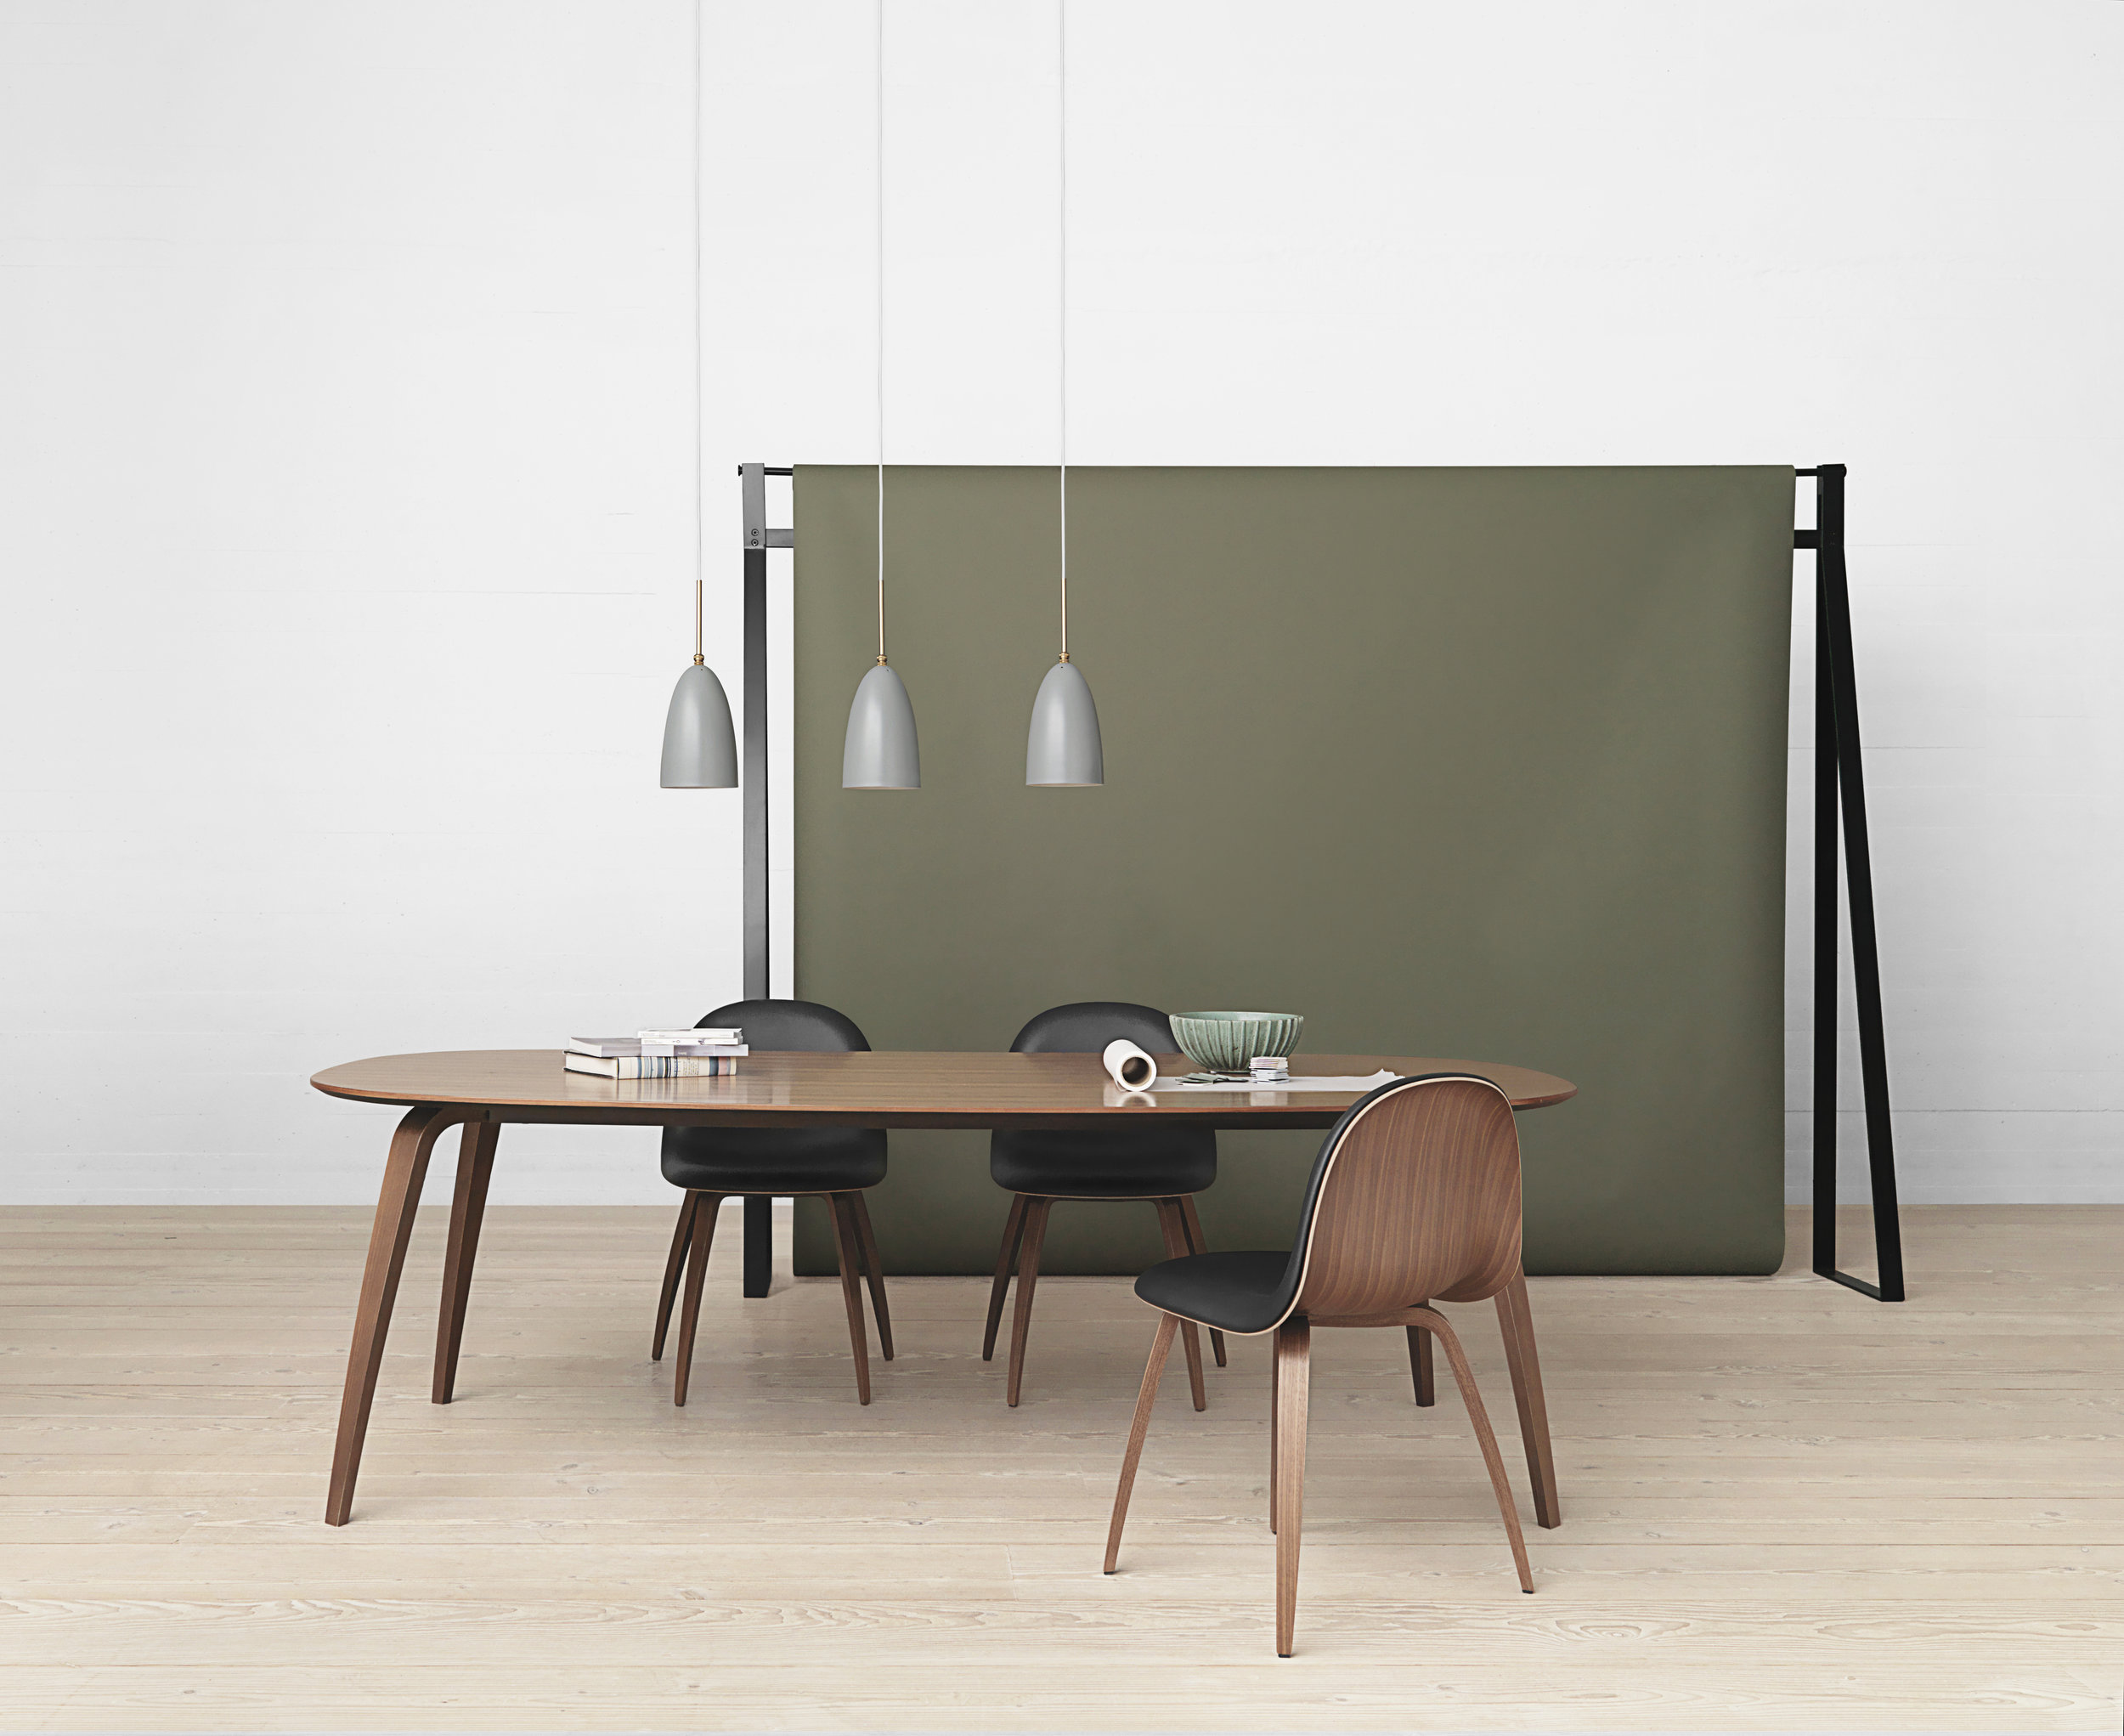 Gubi dining table - elliptical - walnut_Gräshoppa pendant - blue-grey_Gubi 52 chair - walnut and black leather.jpg